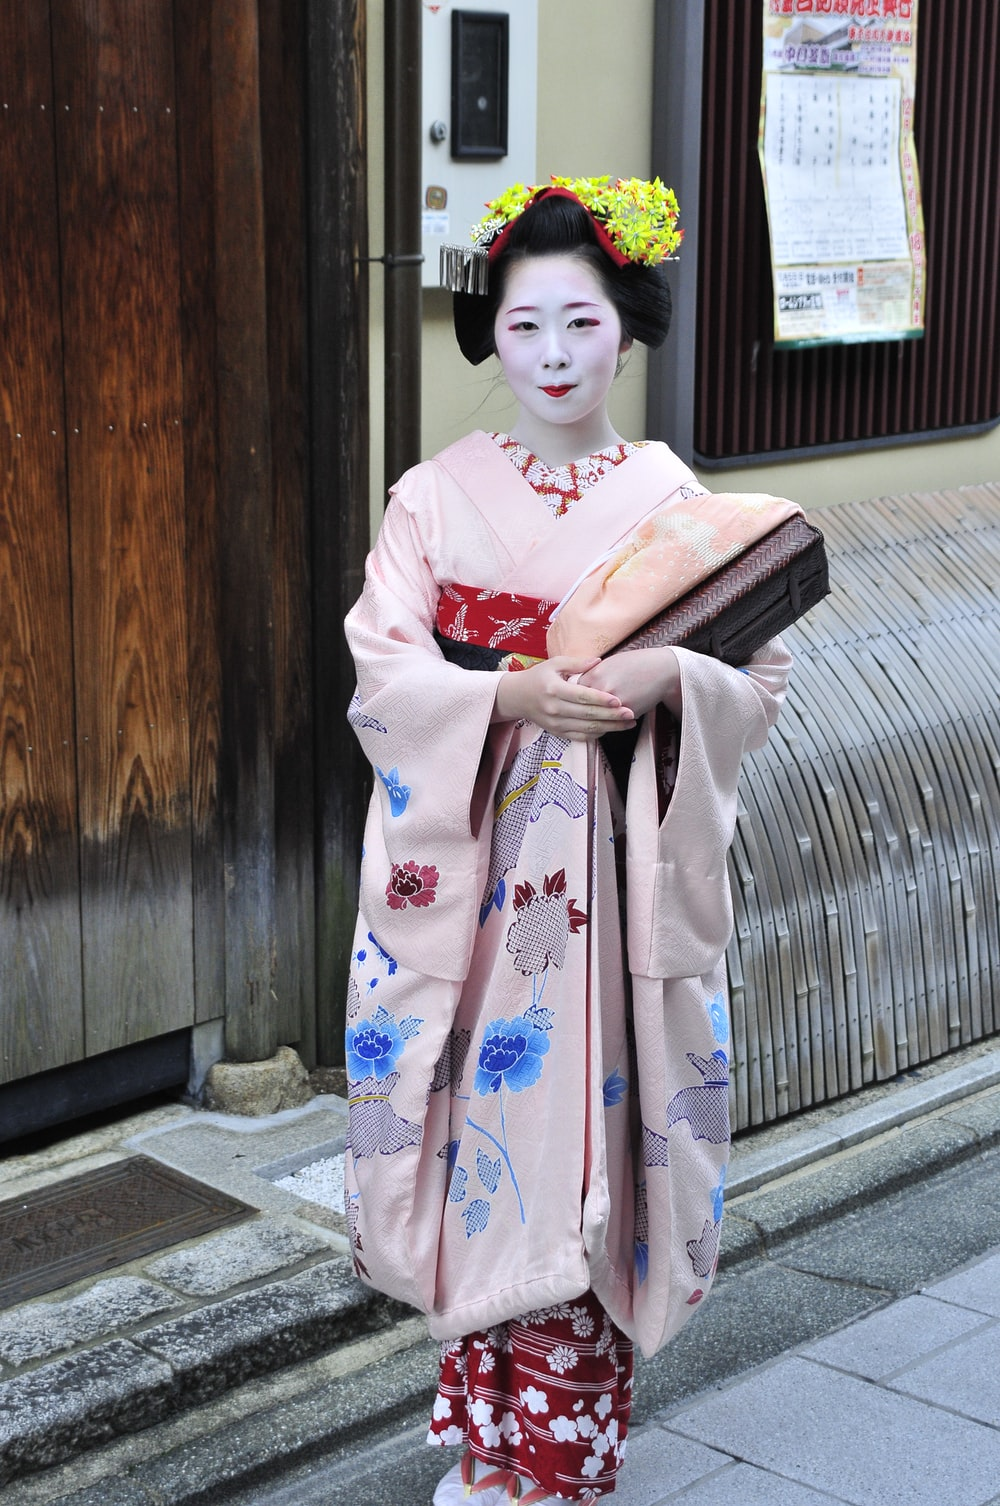 woman in kimono standing on sidewalk